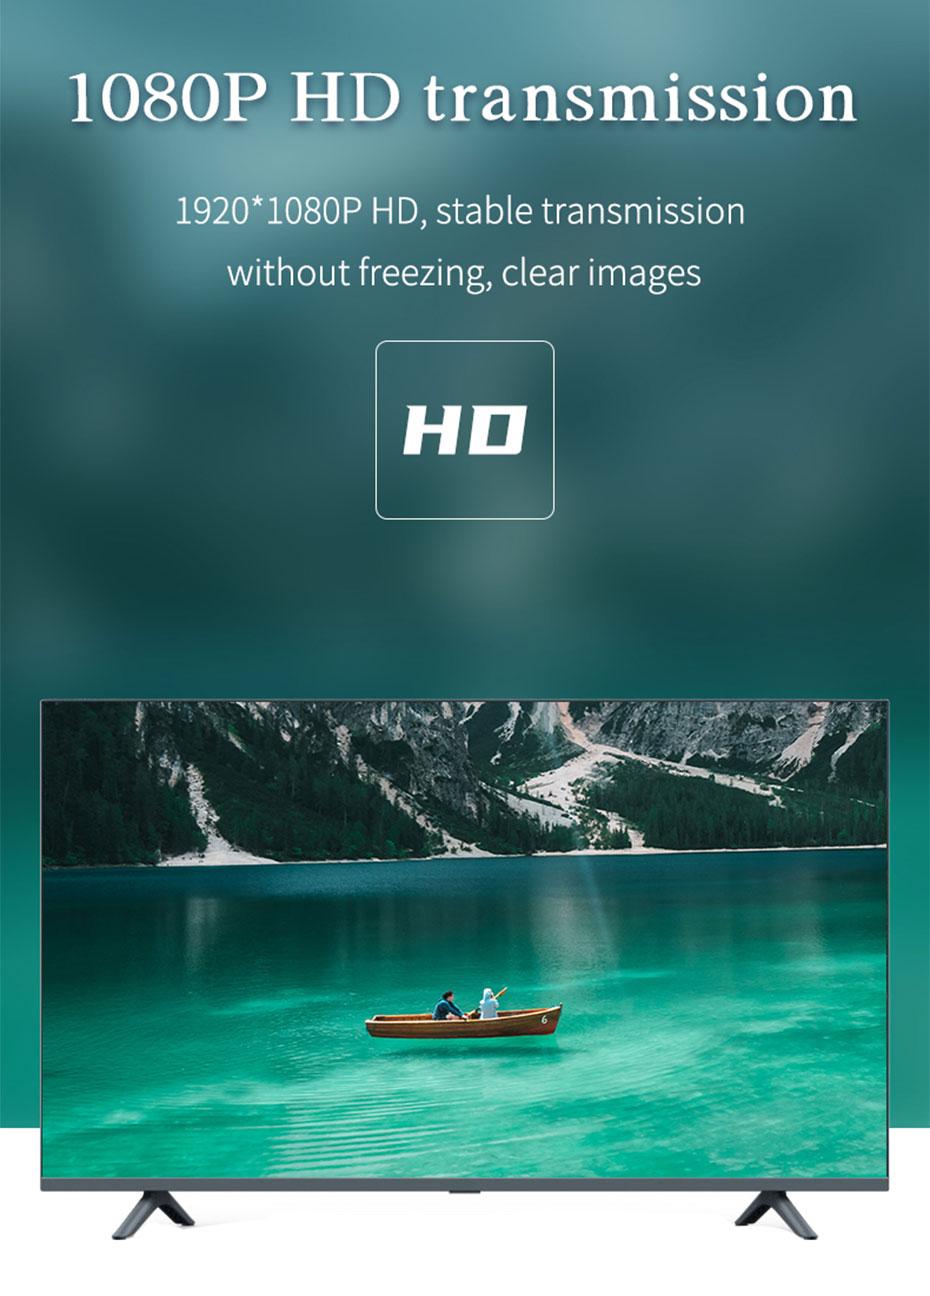 S-Video/AV to HDMI converter AVH supports 1920*1080p HD resolution